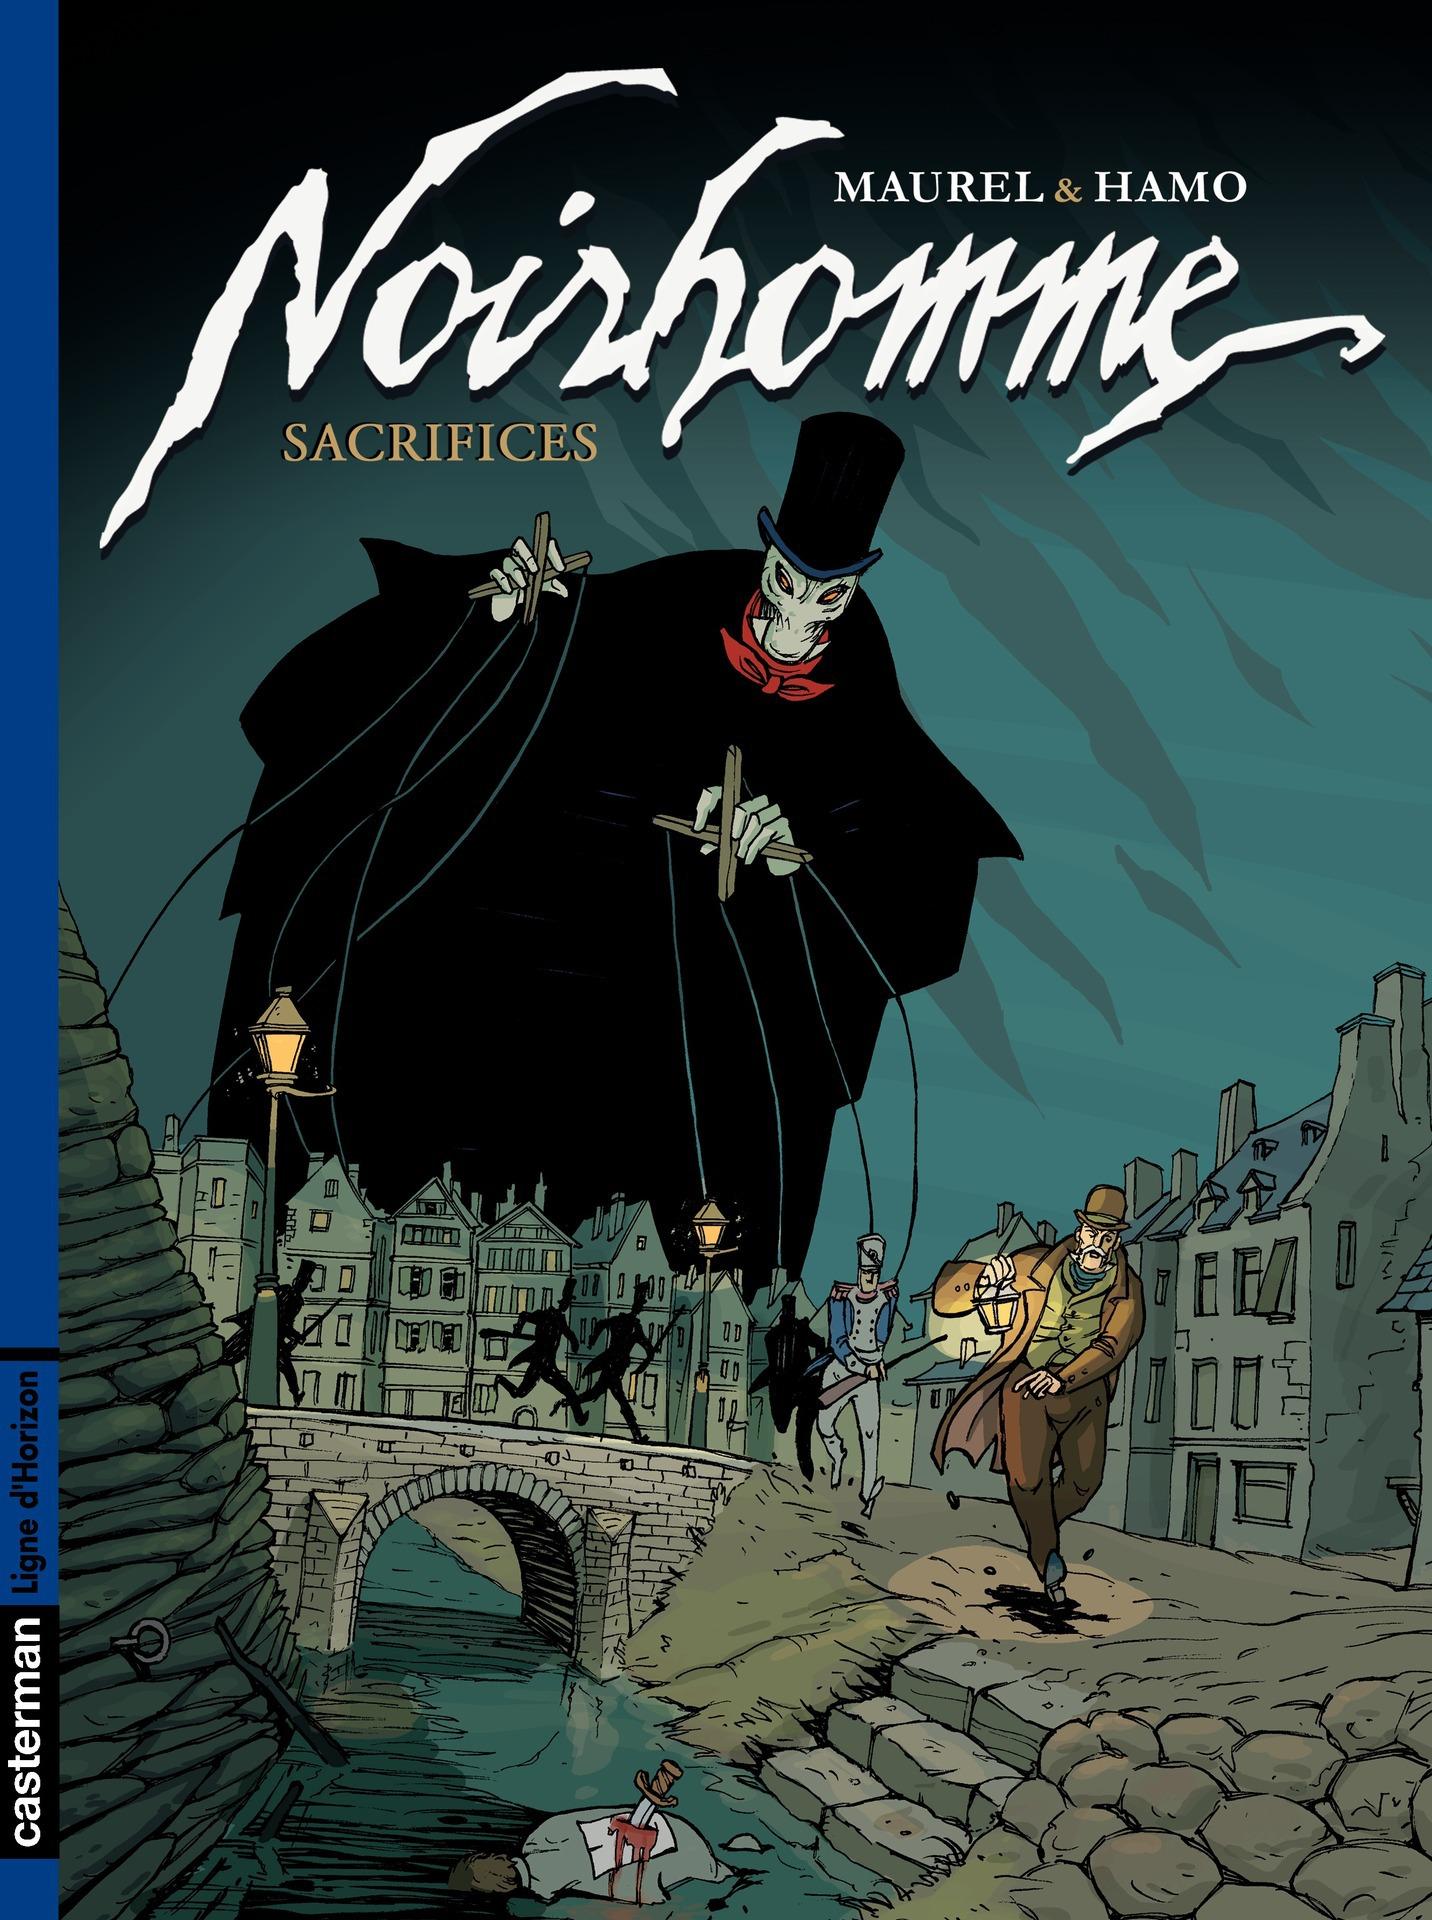 Noirhomme (Tome 2) - Sacrifices